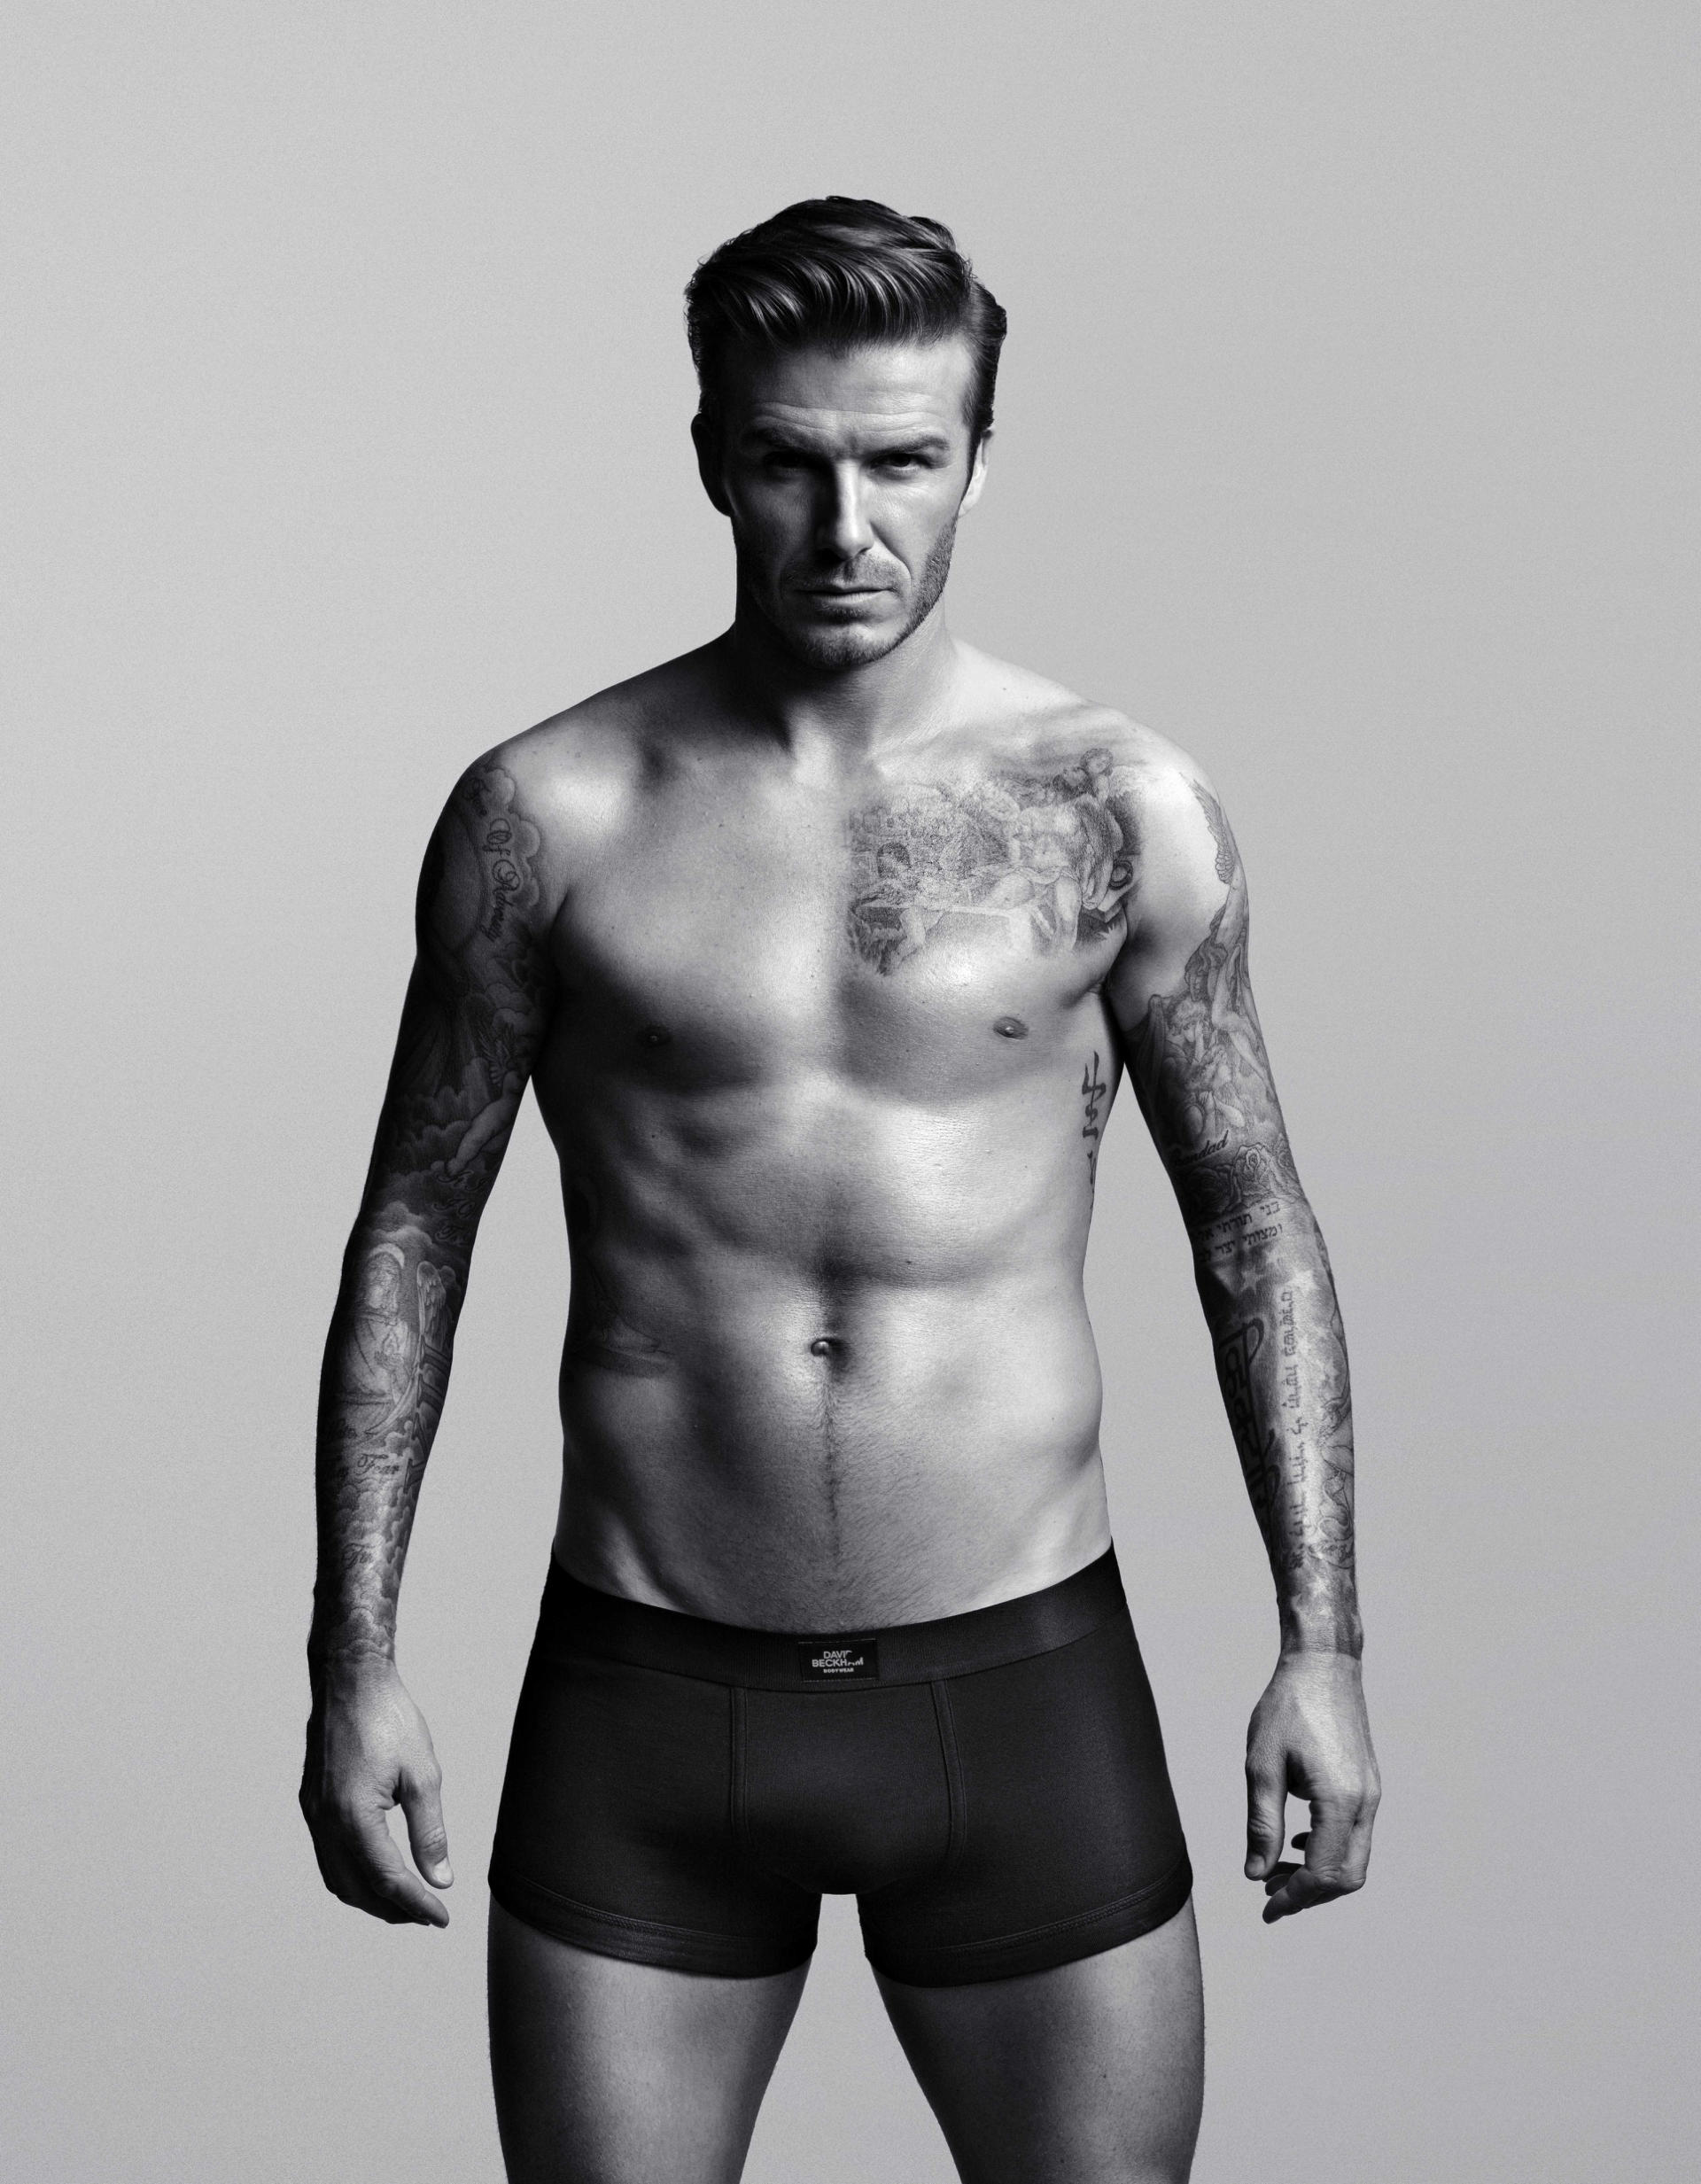 Дэвид Бекхэм, 2012. Фото: David Beckham Bodywear for H&M